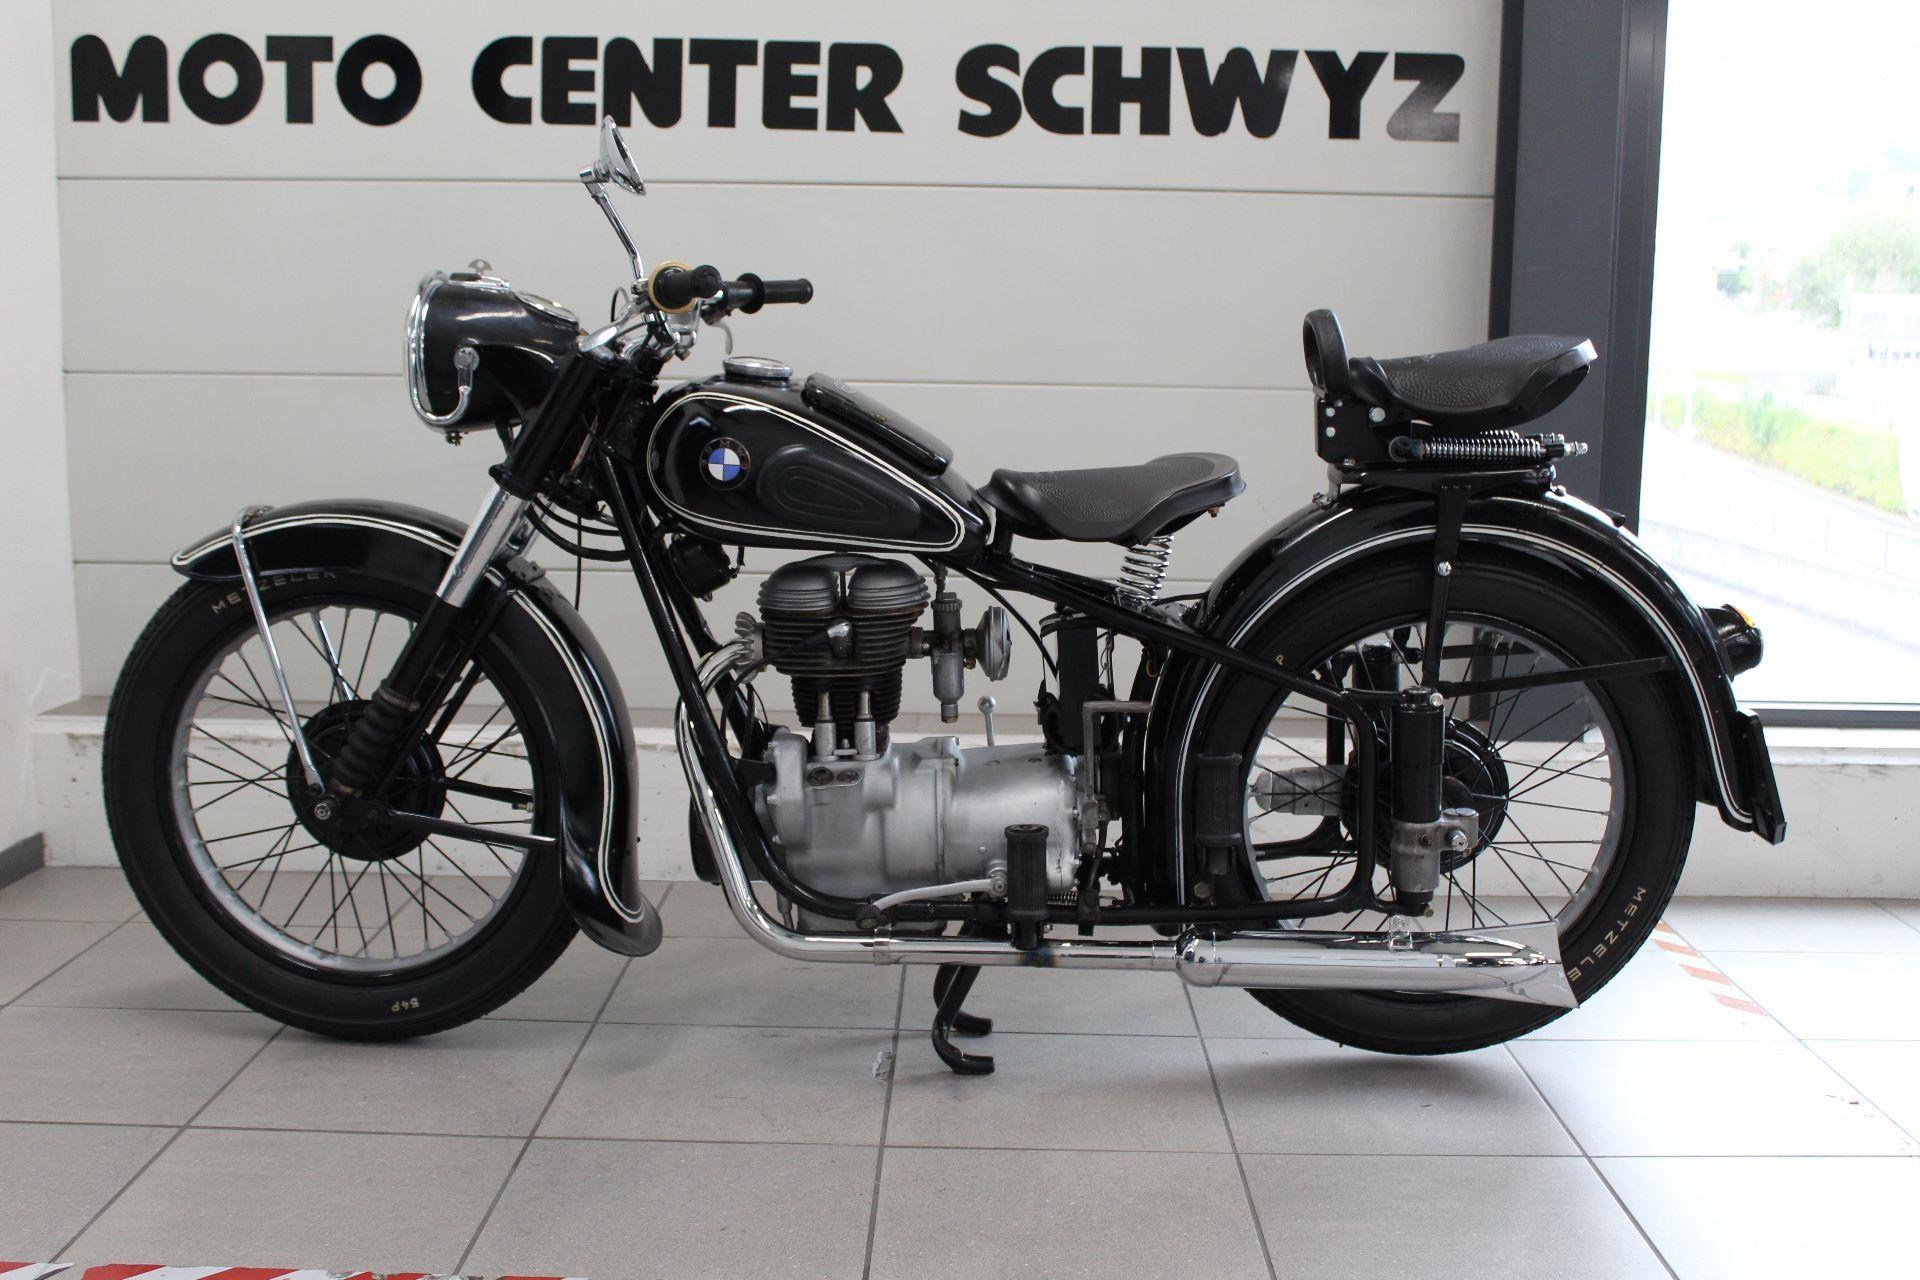 motorrad oldtimer kaufen bmw r 25 moto center schwyz ag. Black Bedroom Furniture Sets. Home Design Ideas